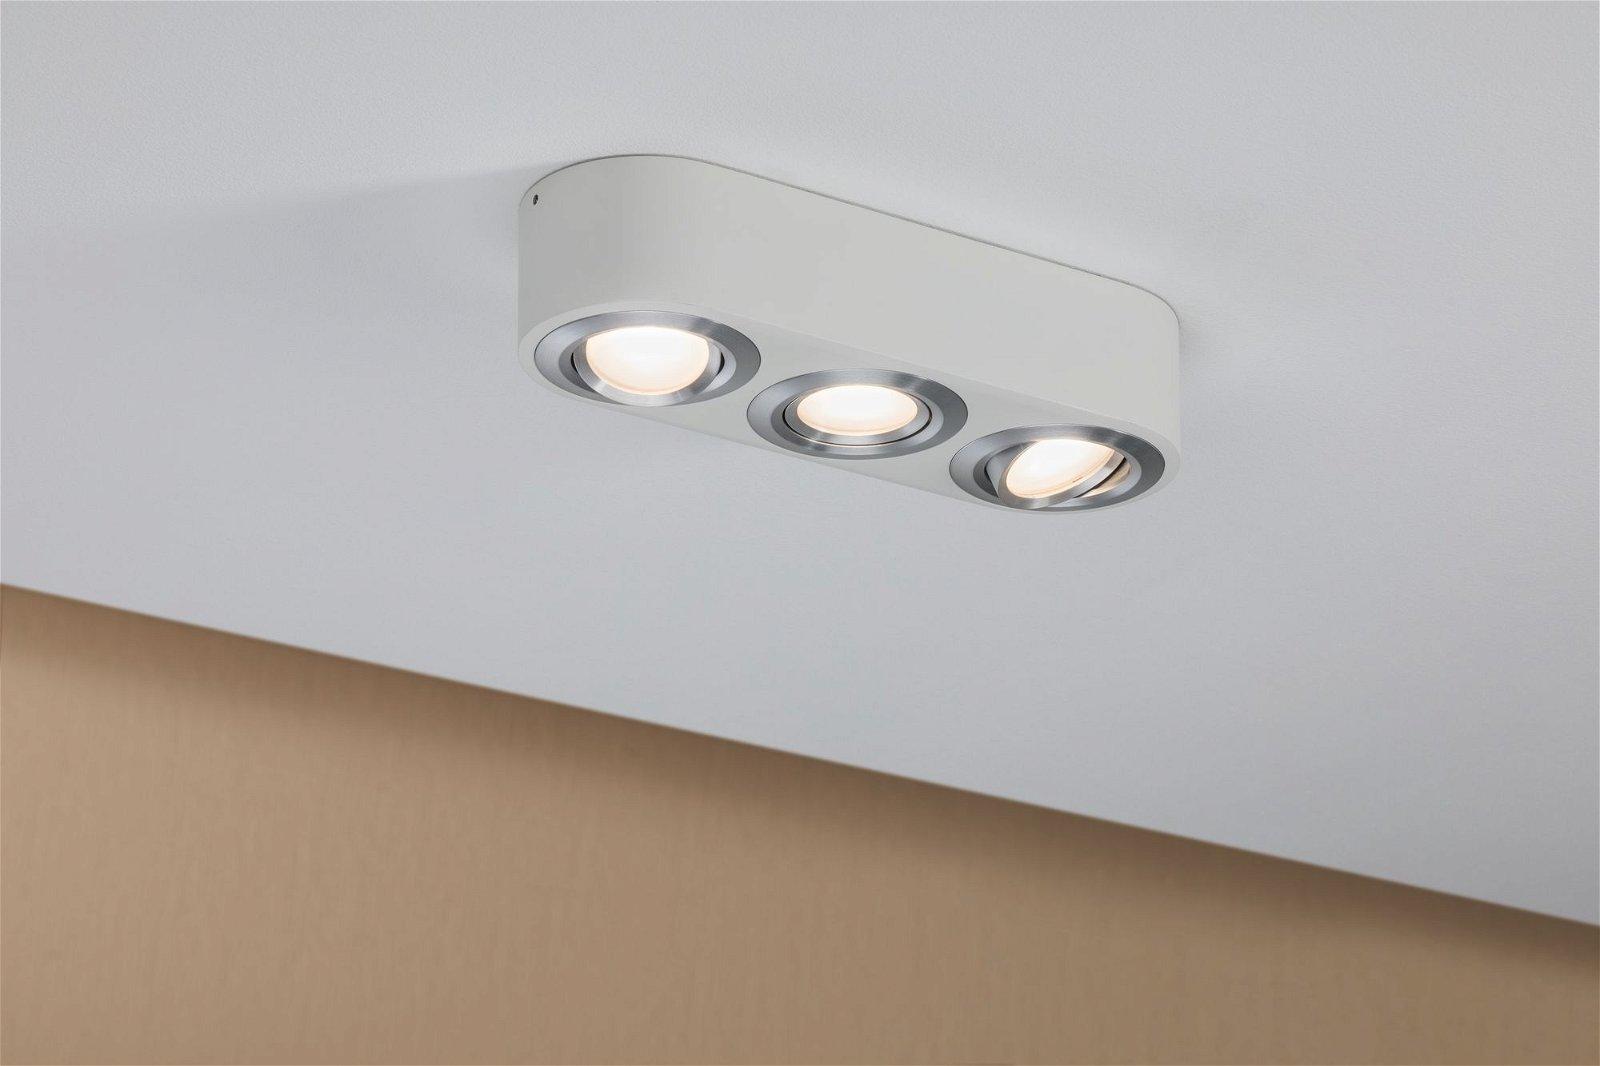 LED Wandleuchte Argun 3000K 3x475lm 230V 3x4,8W Alu gebürstet